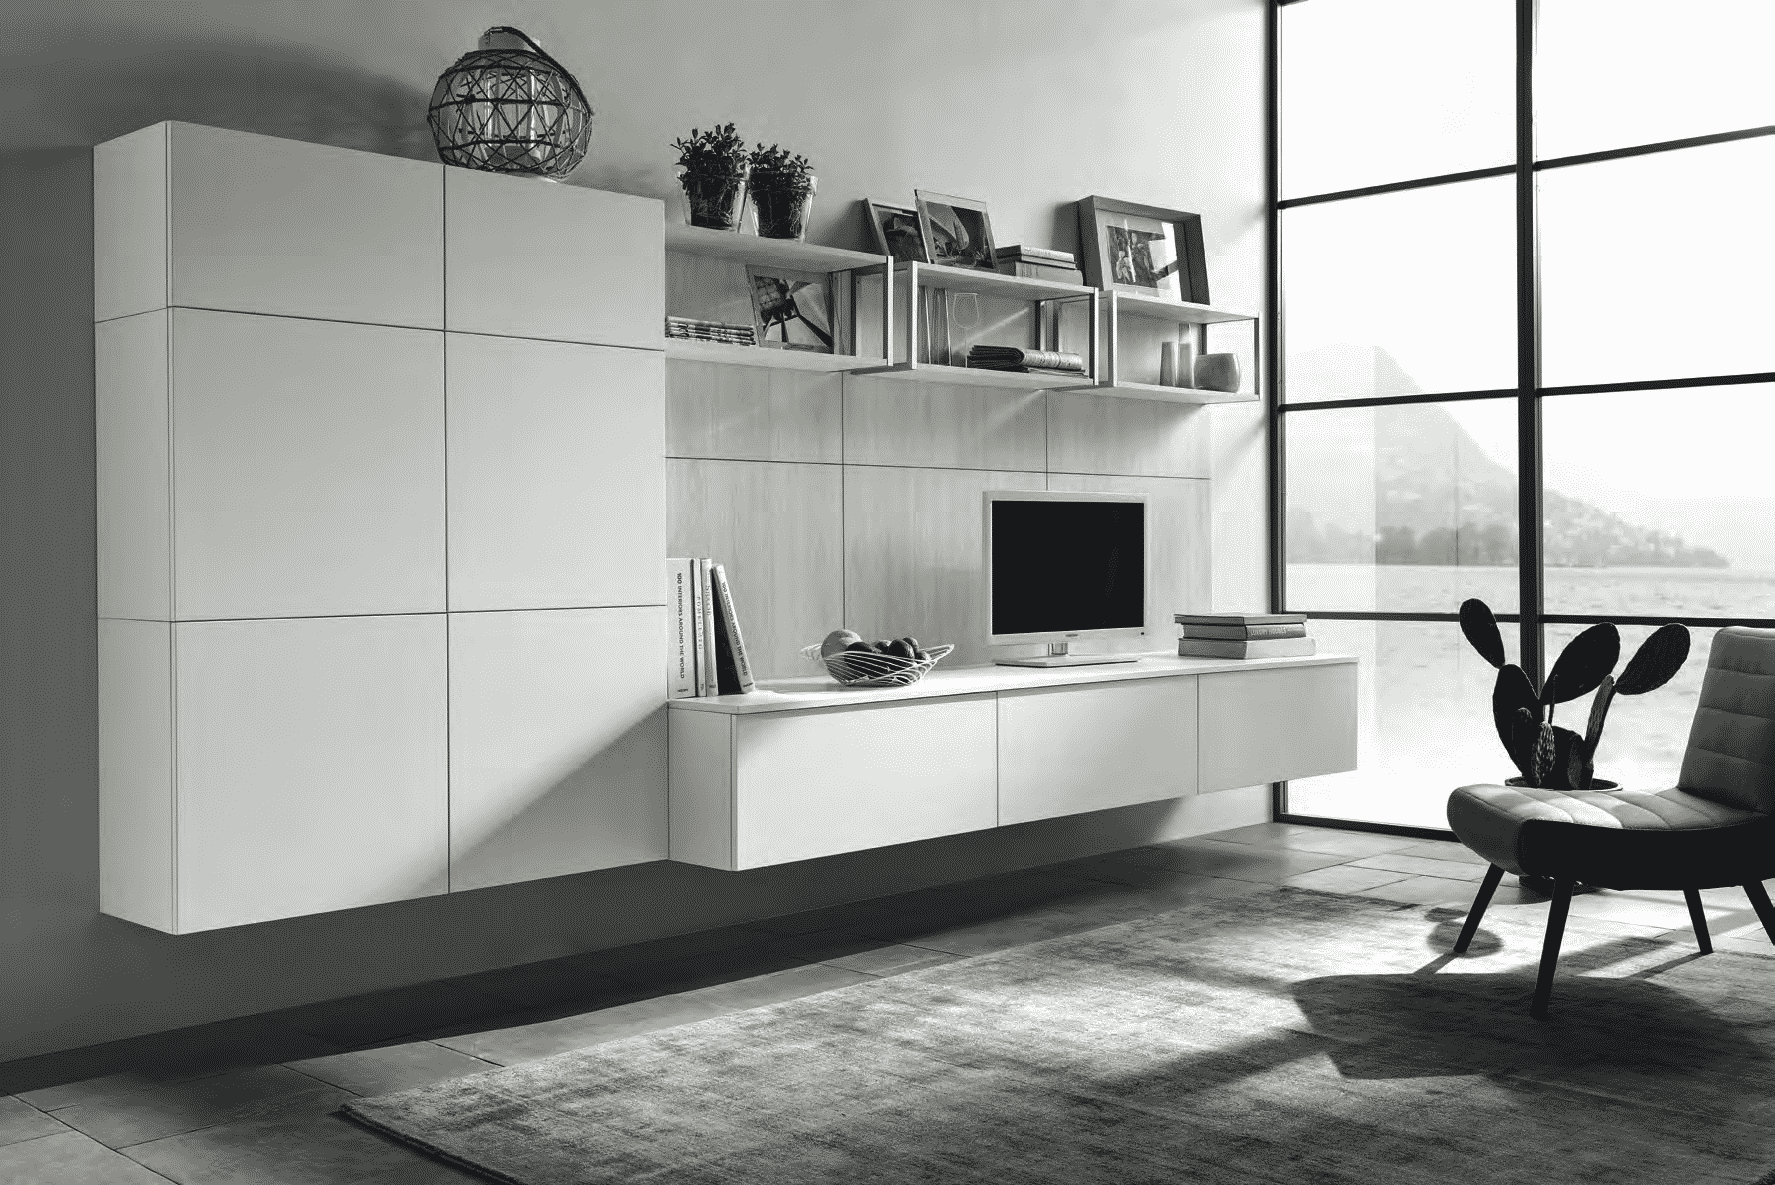 Essenza κουζινα καπλαμα σε λευκο χρωματισμο λεπτομερειες